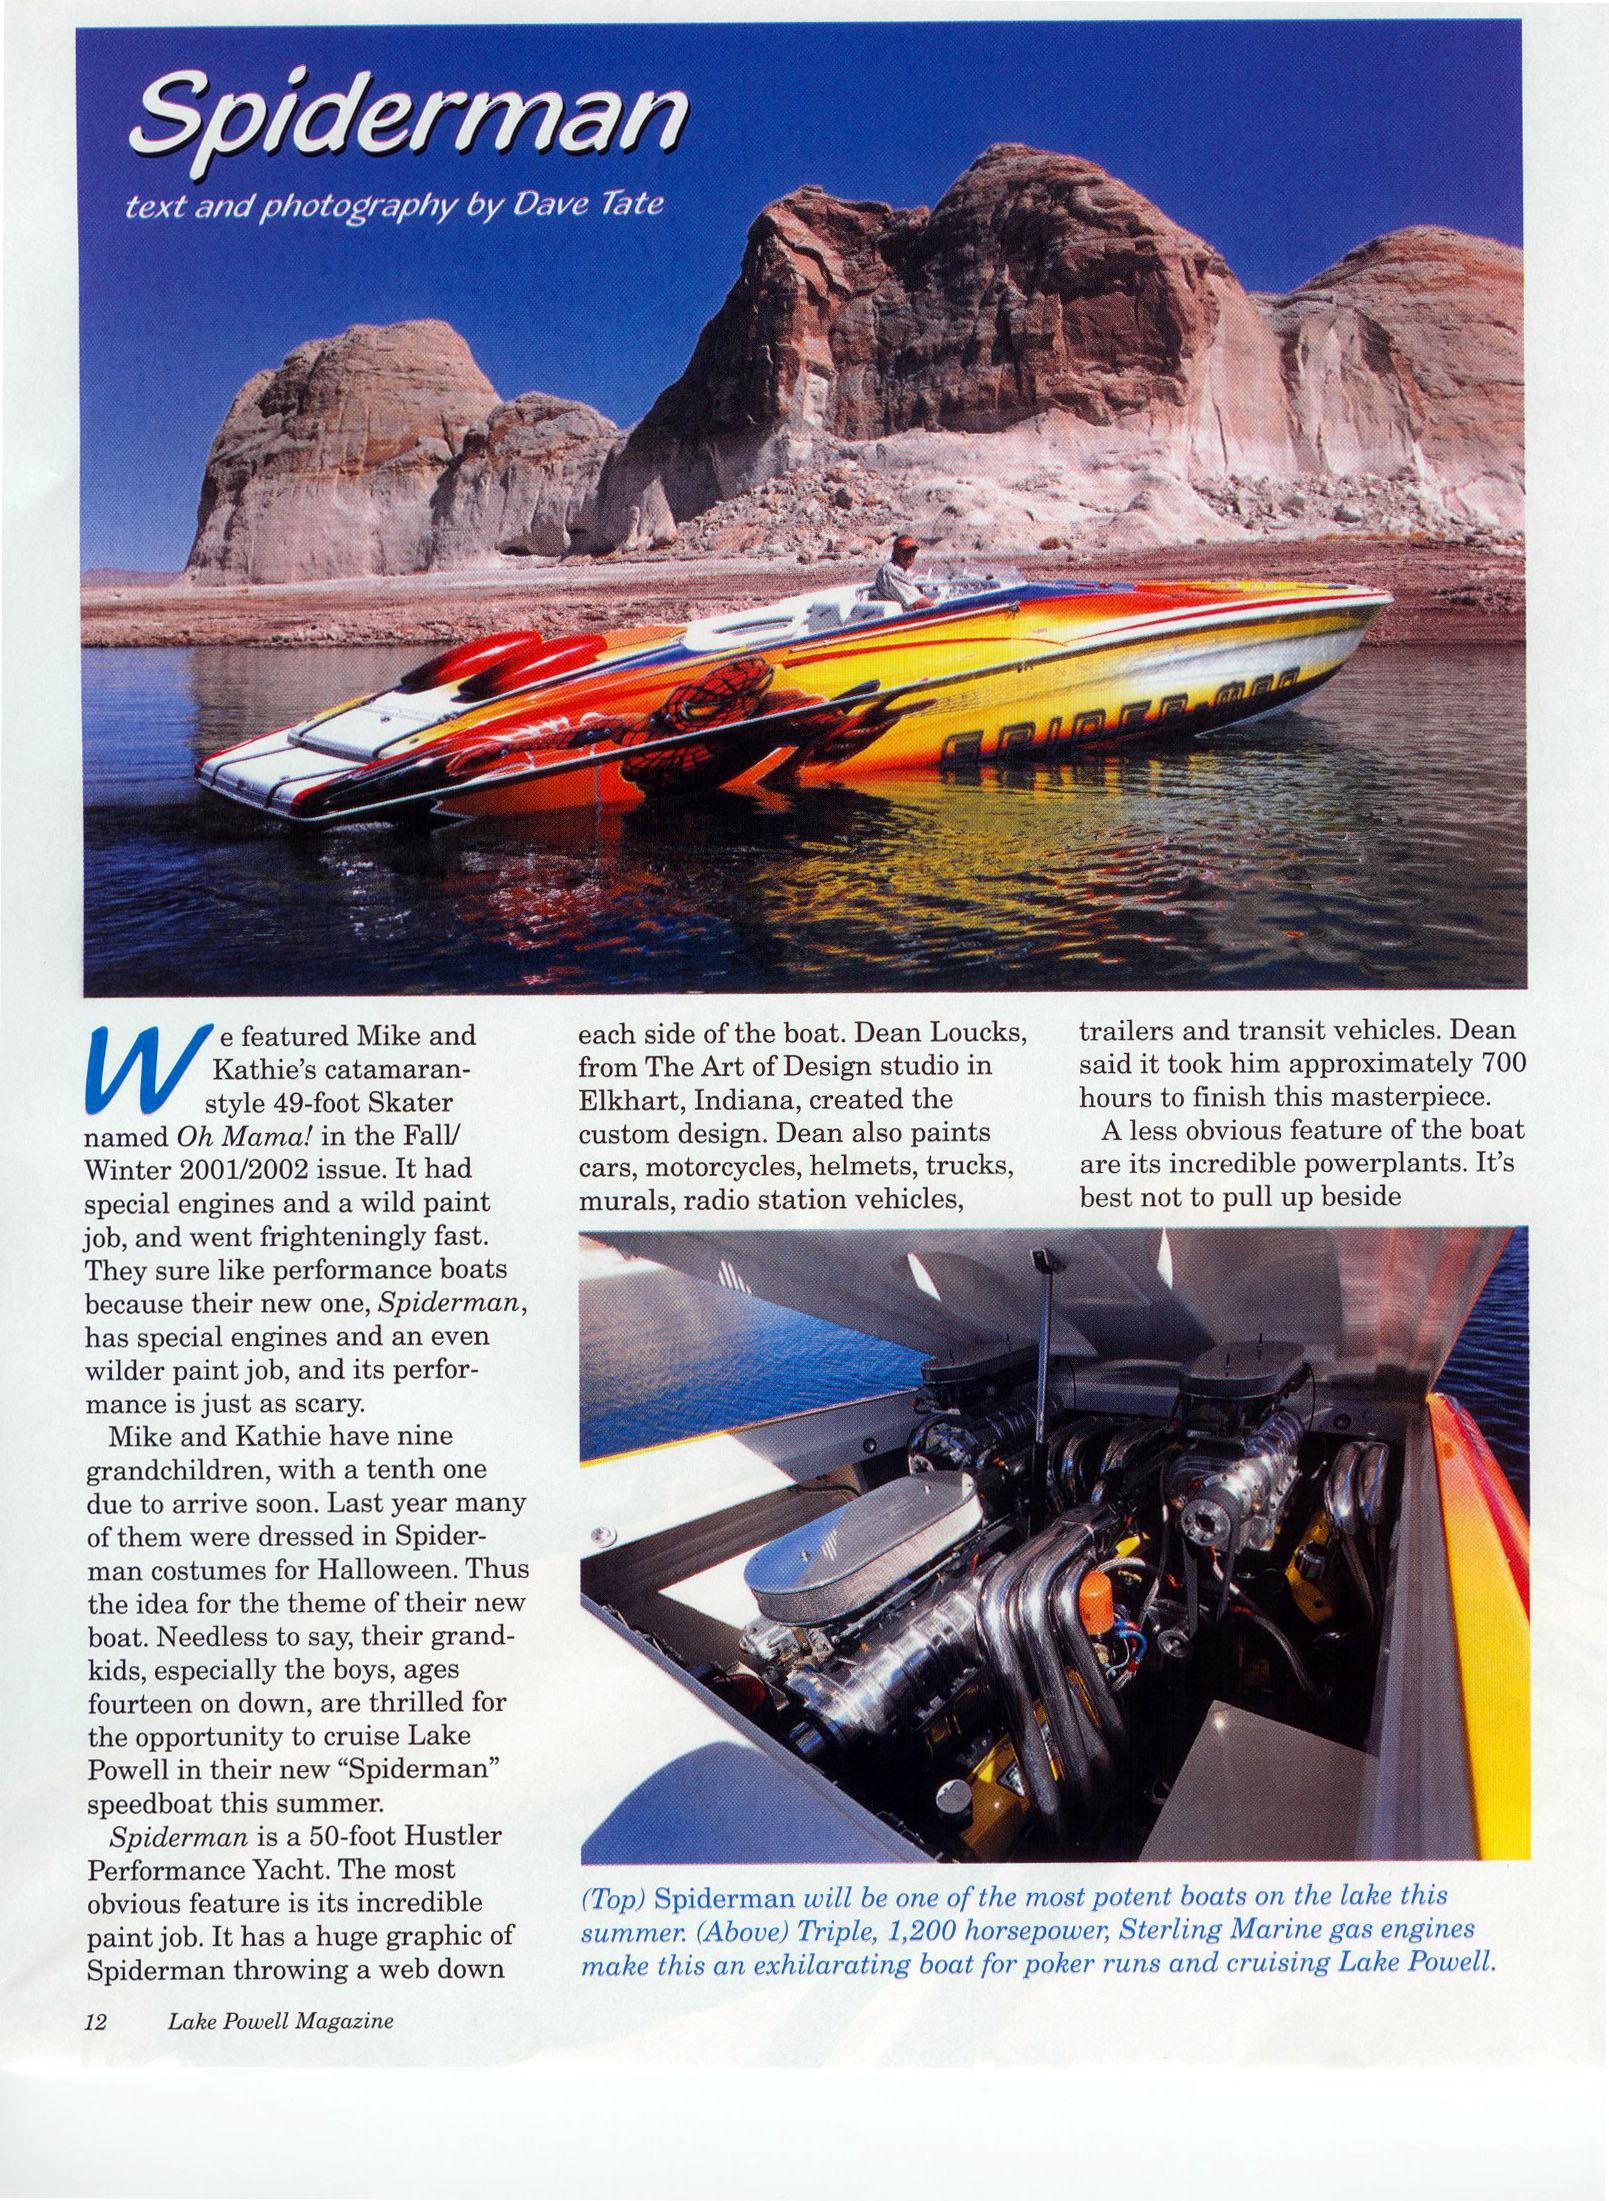 50' Performance Yacht, Lake Powell Magazine, jpg, 941KB · «